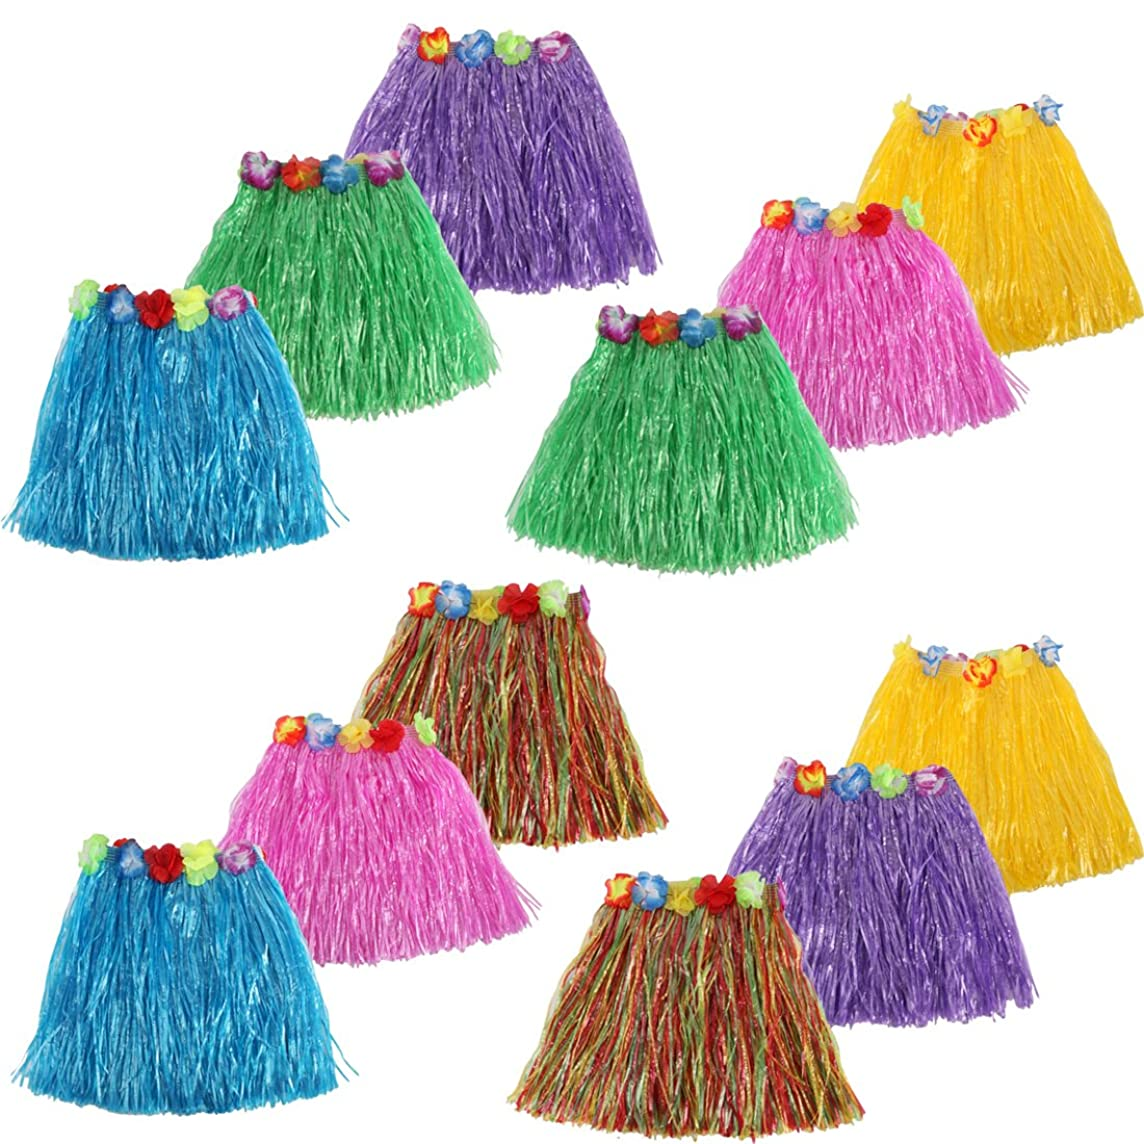 kilofly 12pc Girls Elastic Hawaiian Dancer Grass Hula Skirts Luau Party Favors